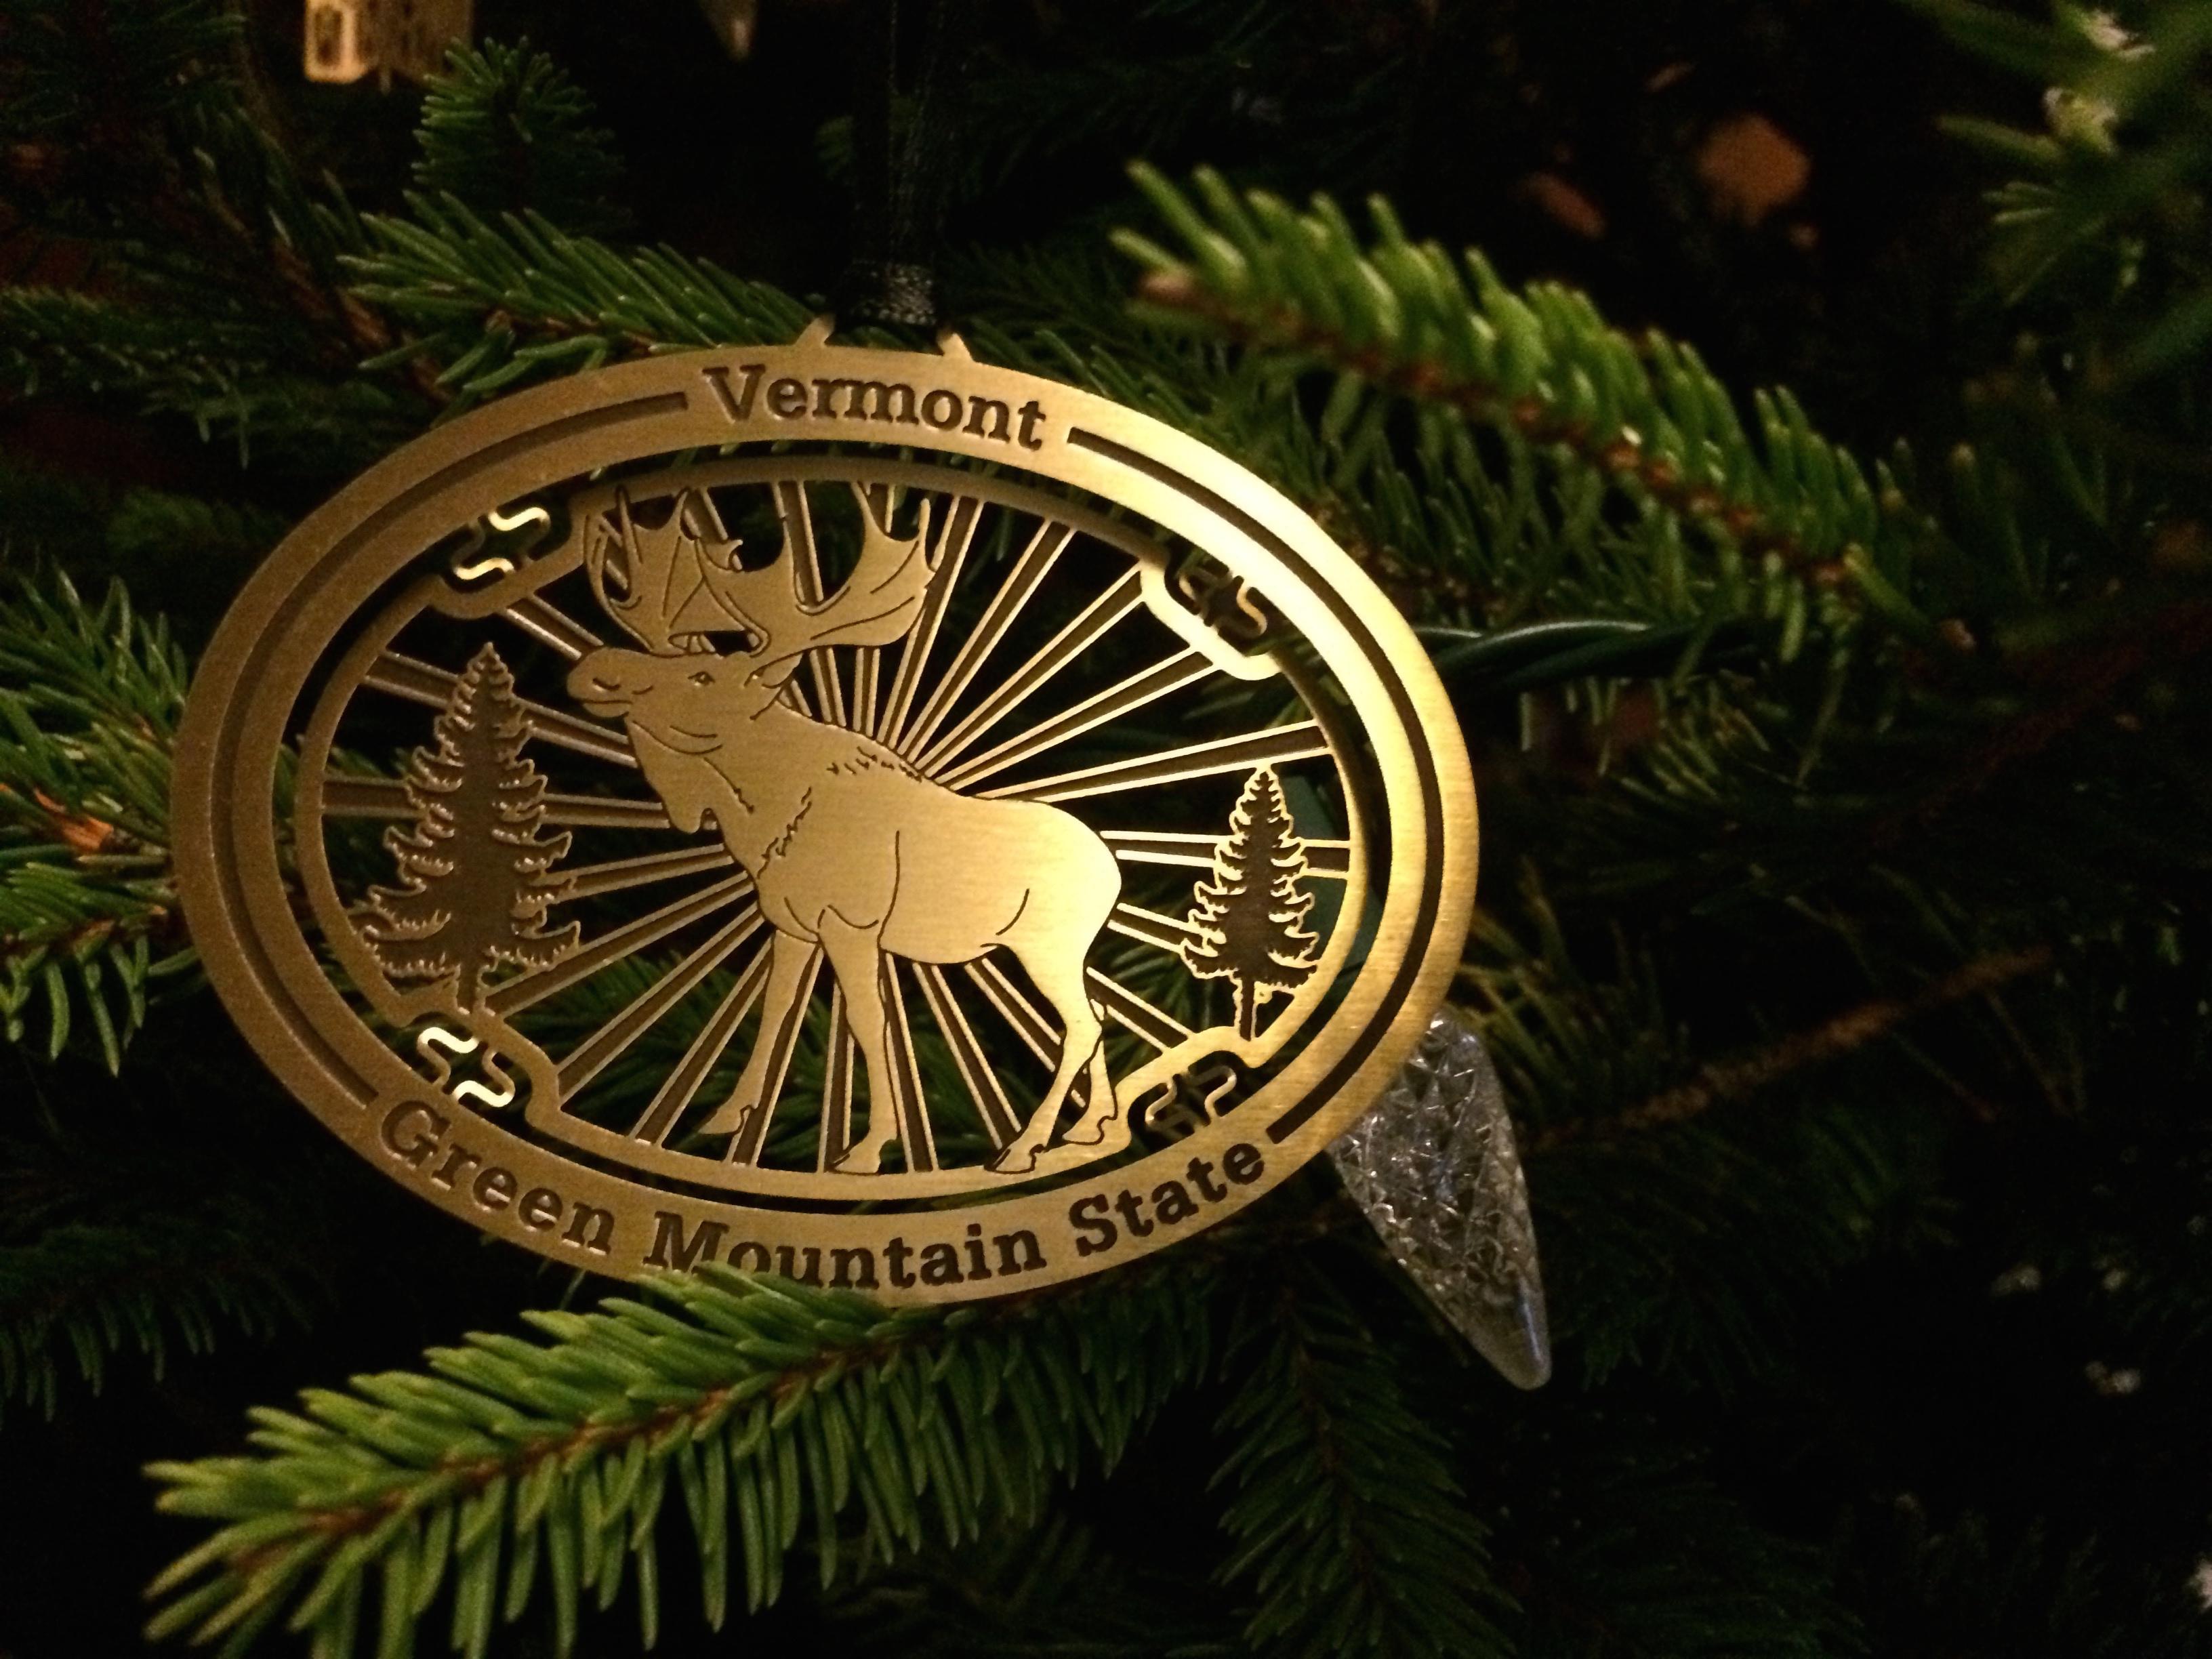 Drama christmas ornaments - Vermont Christmas Ornament